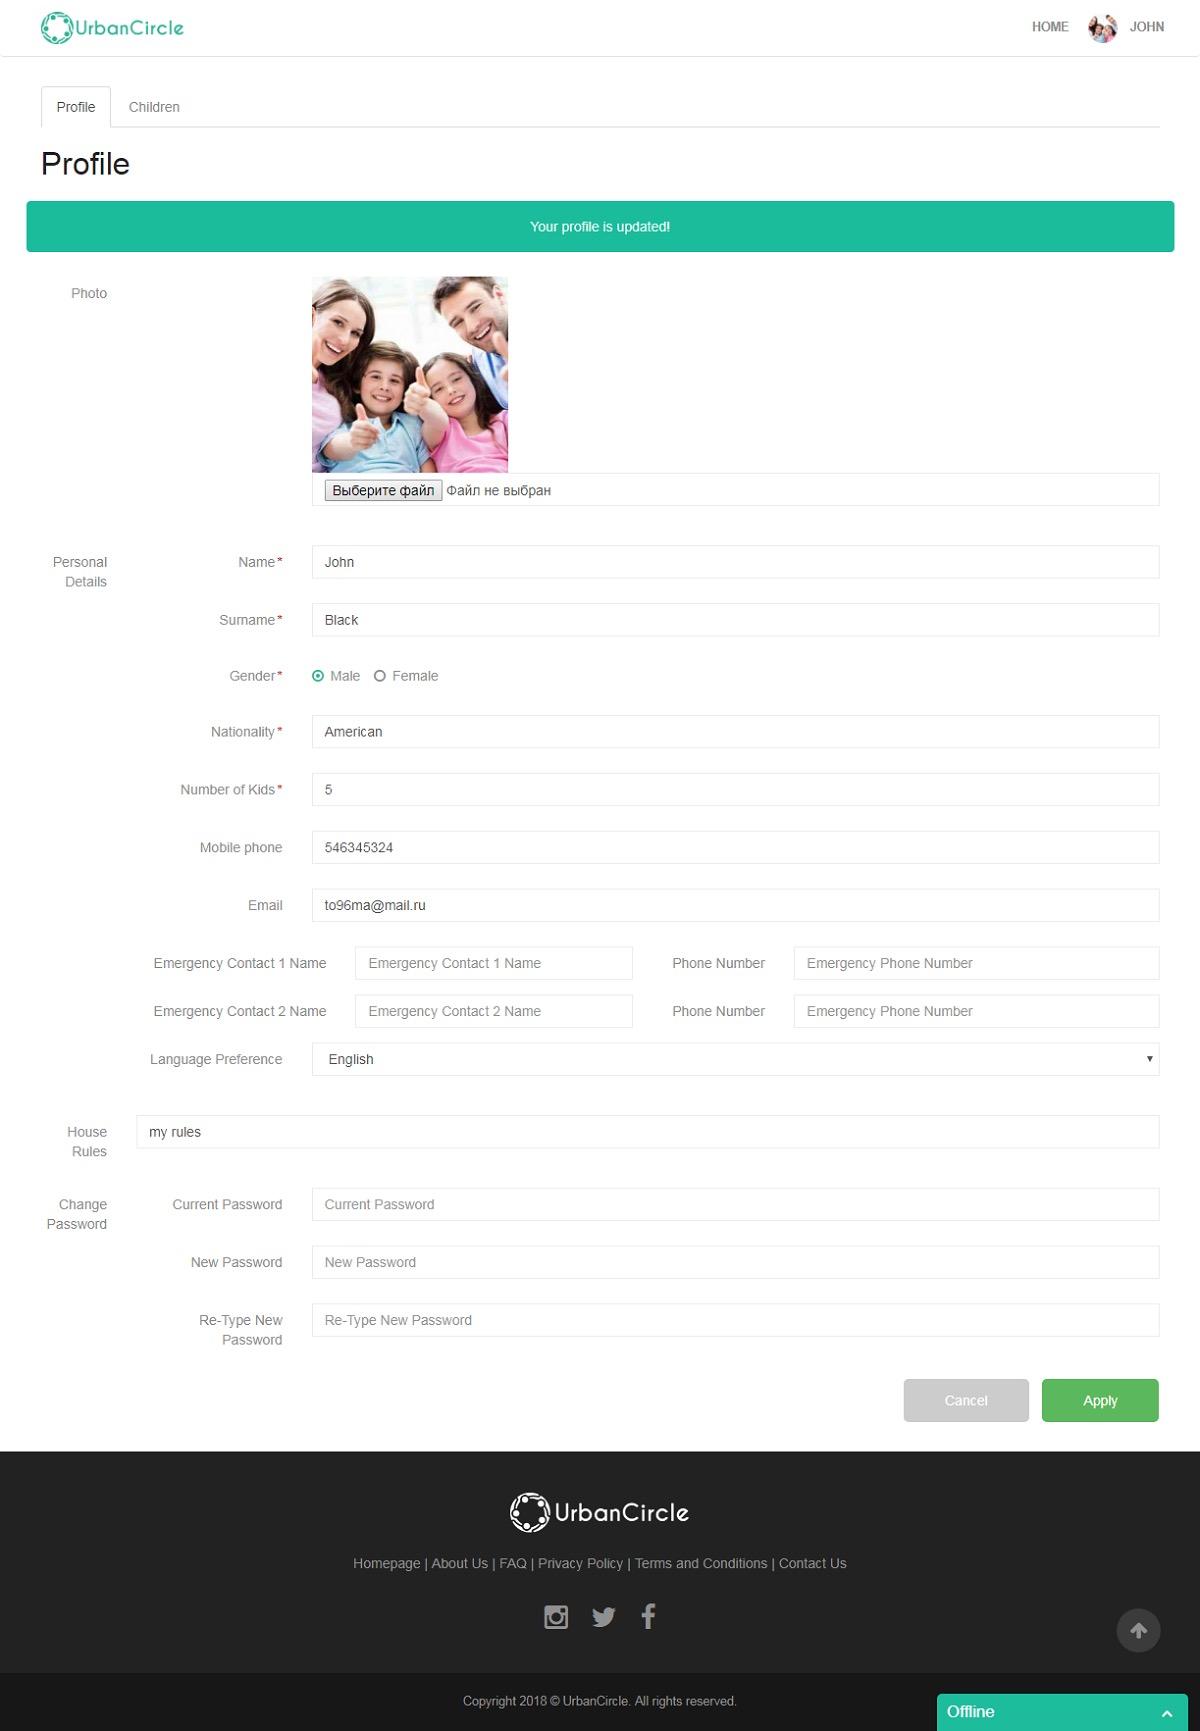 family-service-providers-platform5ba3fb4863726917270a5048